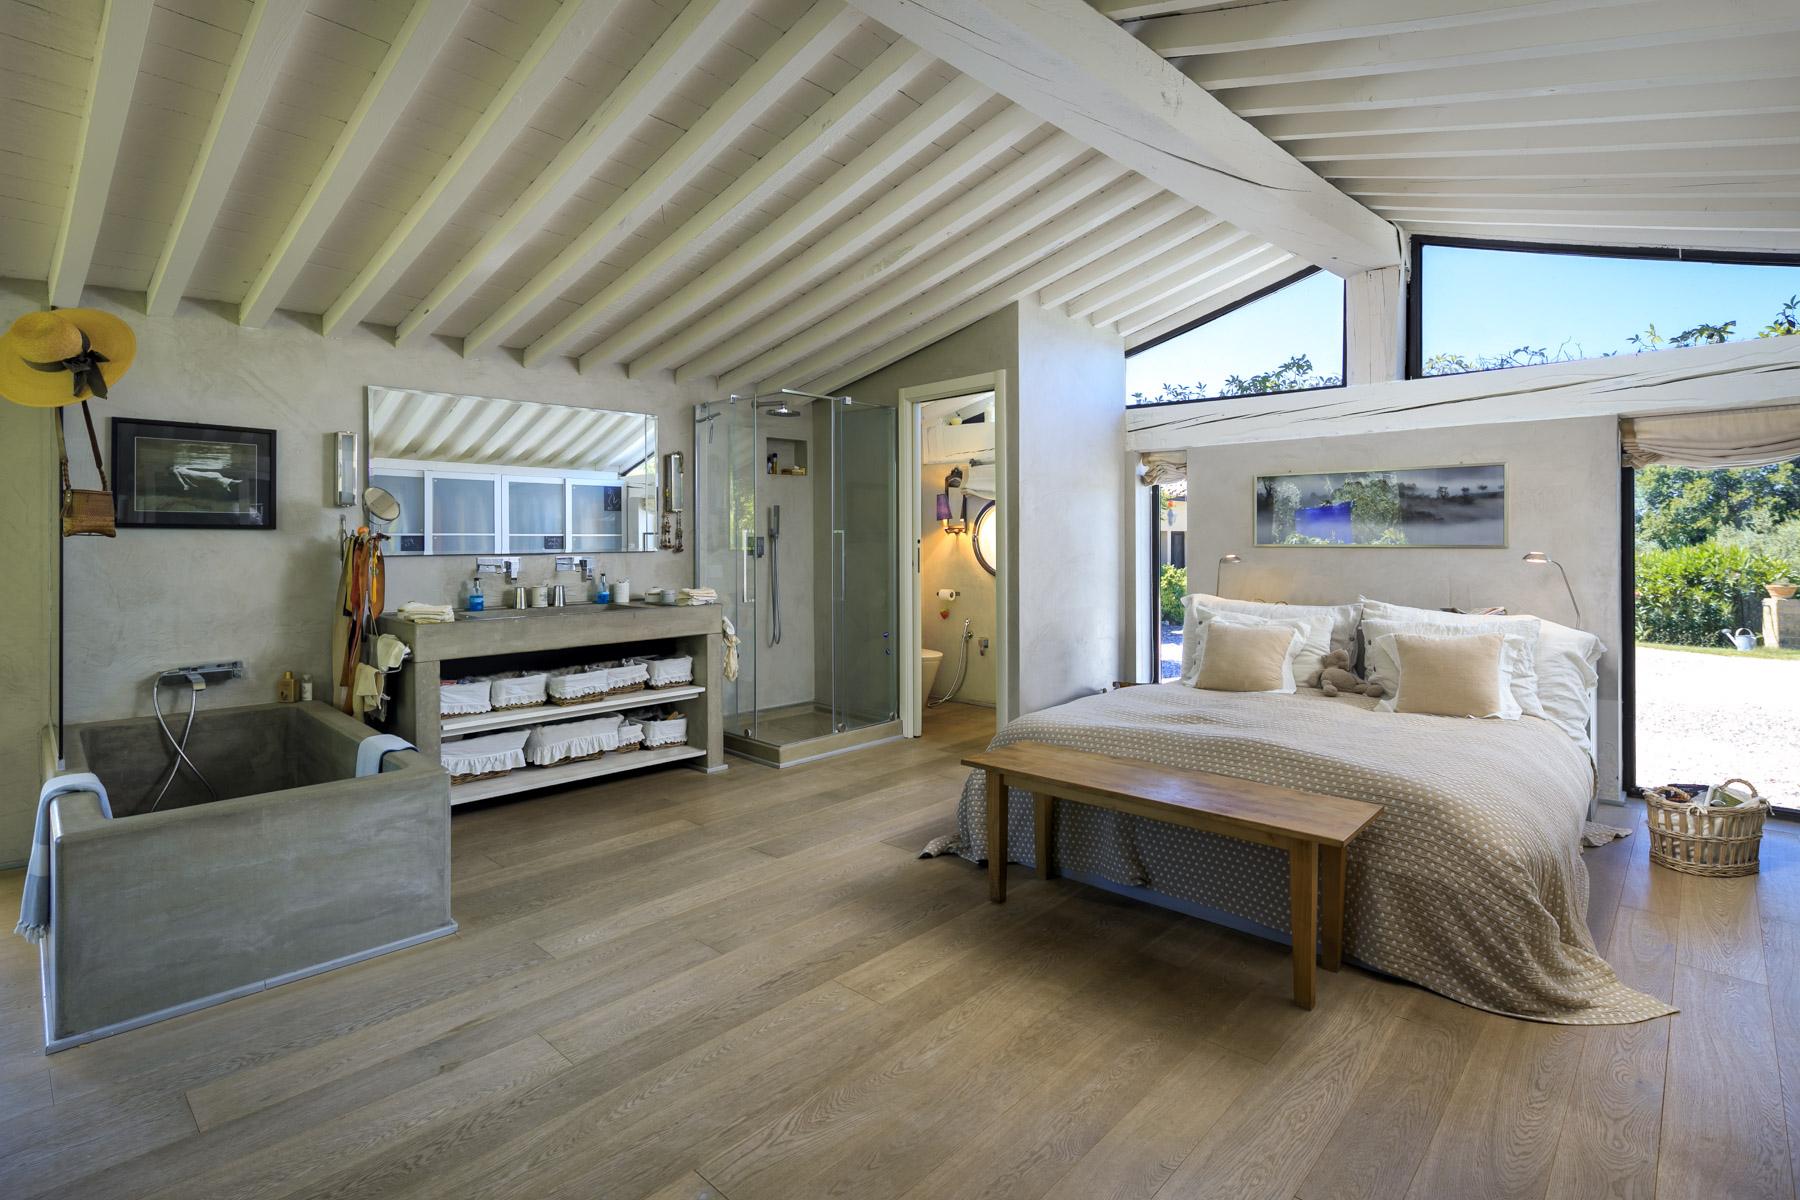 Villa in Vendita a Santa Luce: 5 locali, 270 mq - Foto 15